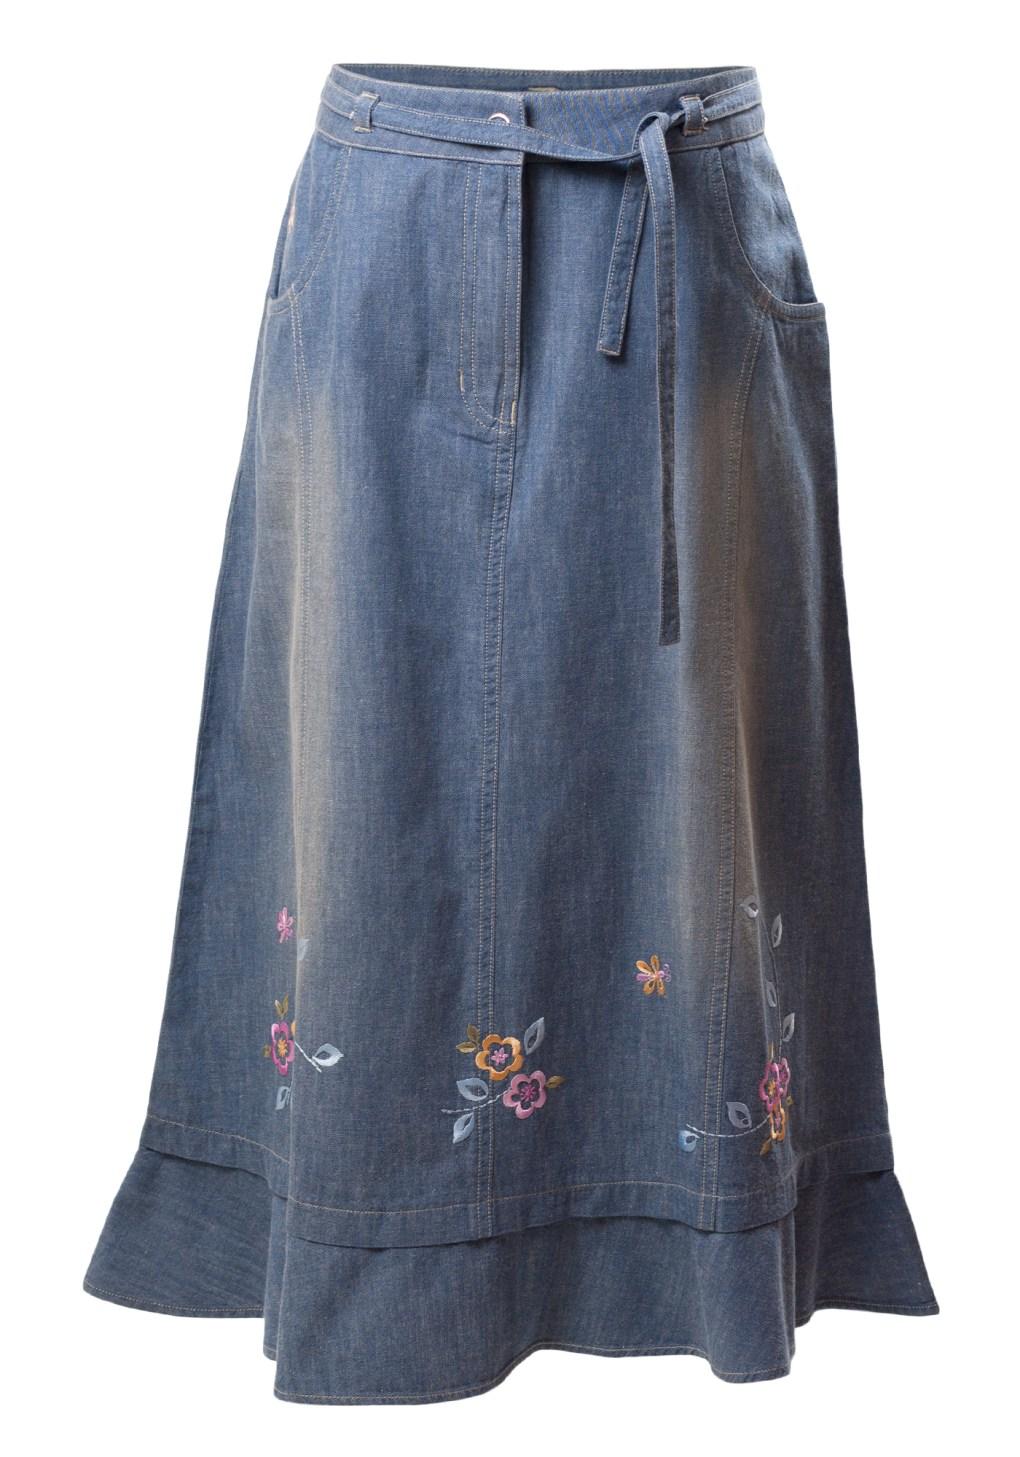 Chic Downtown Detroit Girls Denim Skirt